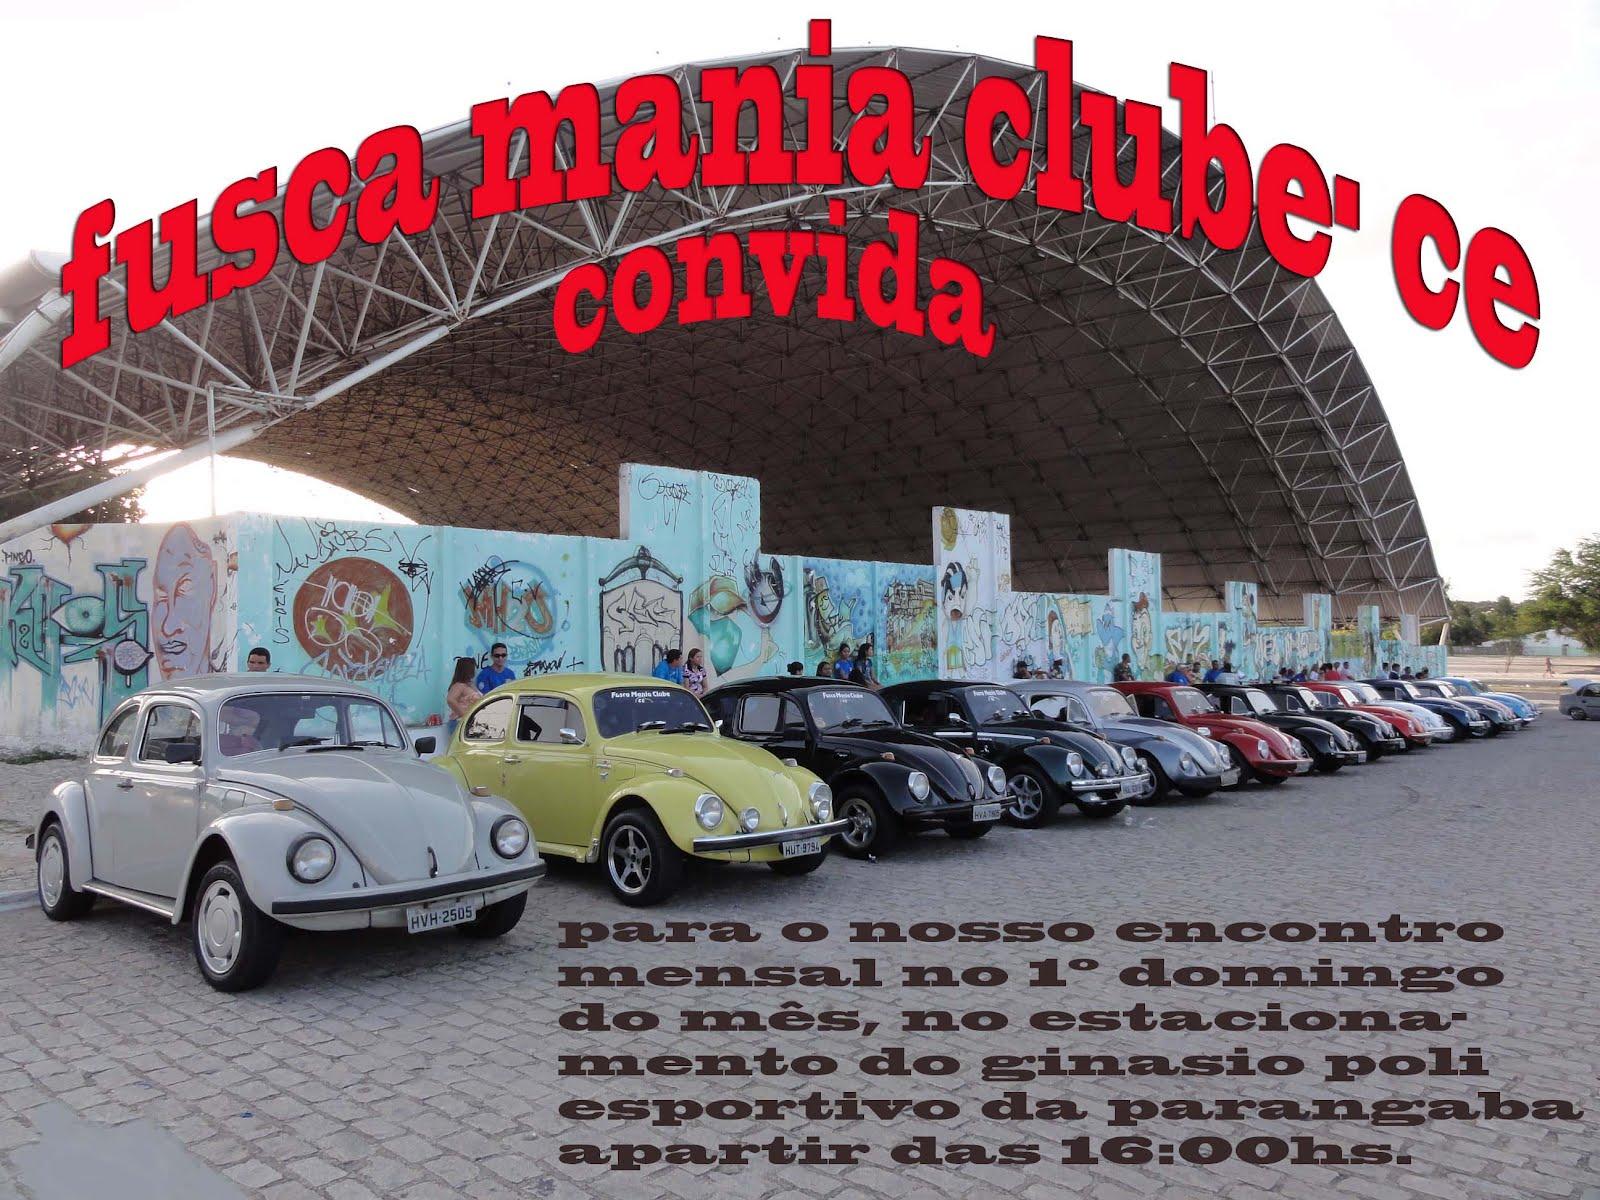 FUSCA MANIA CLUBE-CE